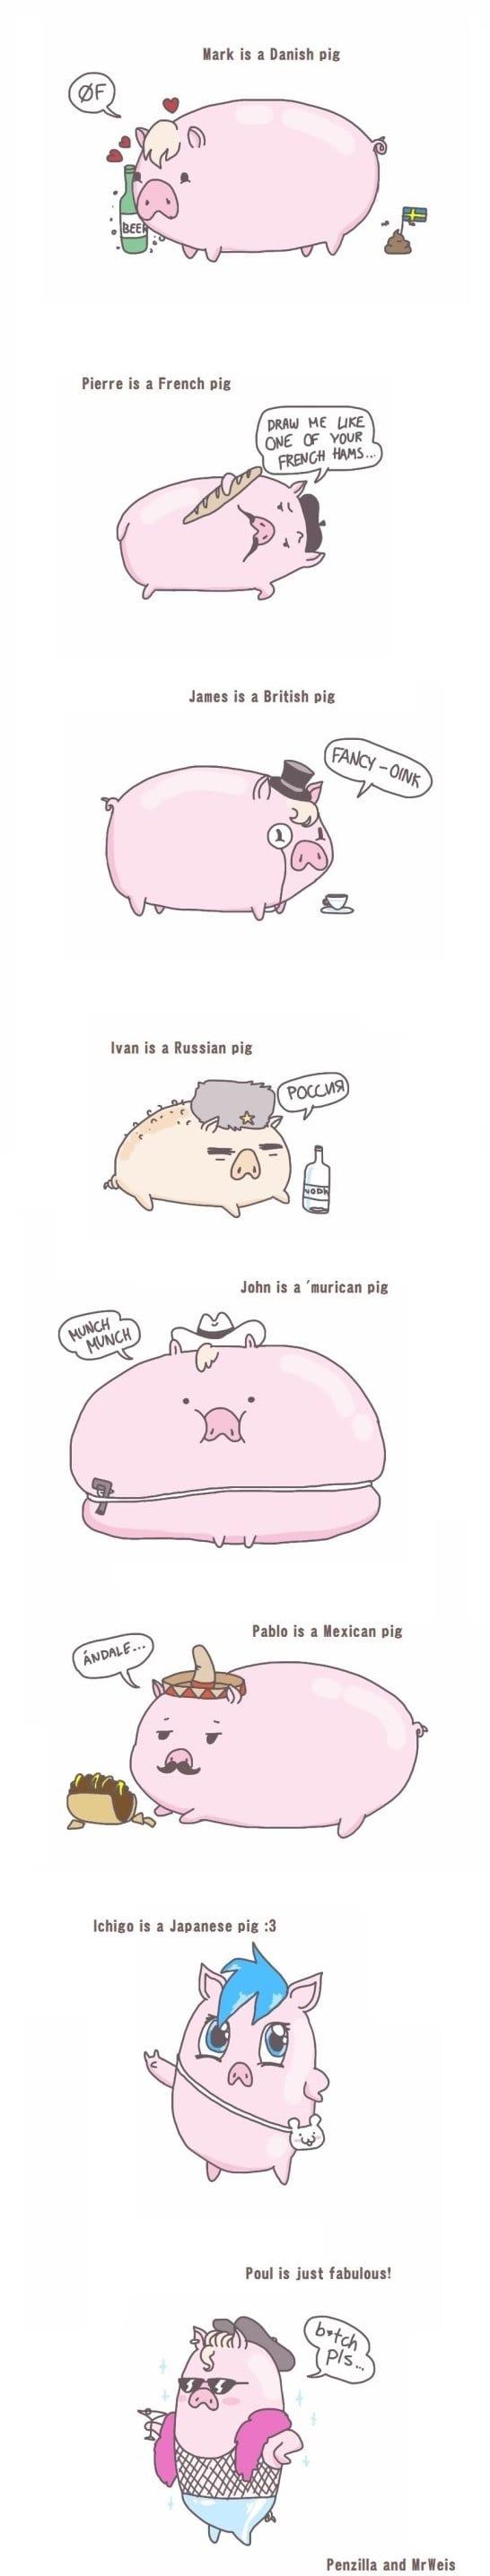 funny-pigs-memes